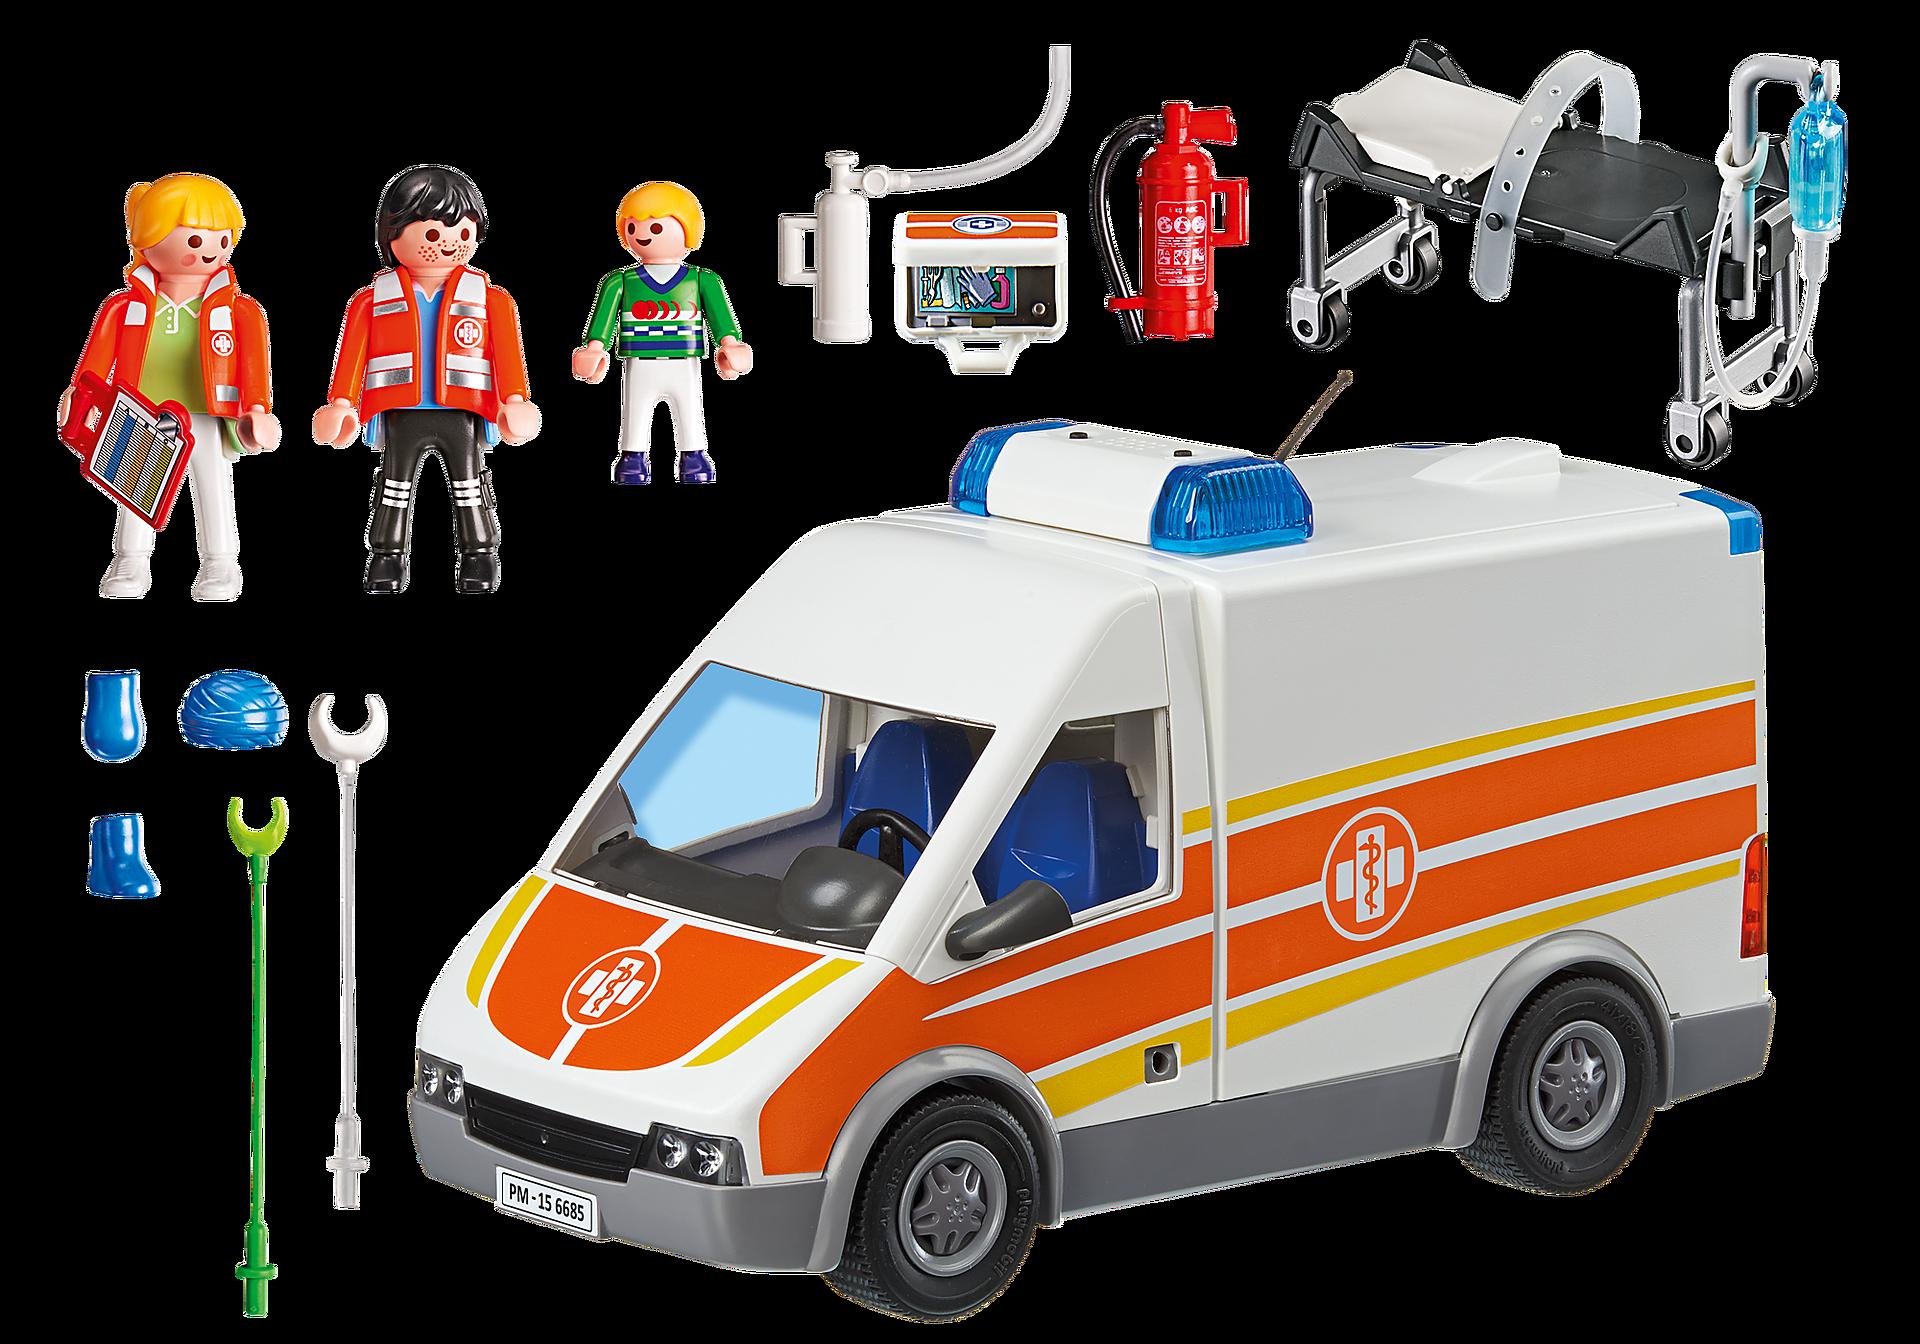 http://media.playmobil.com/i/playmobil/6685_product_box_back/Ambulancia con Luces y Sonido